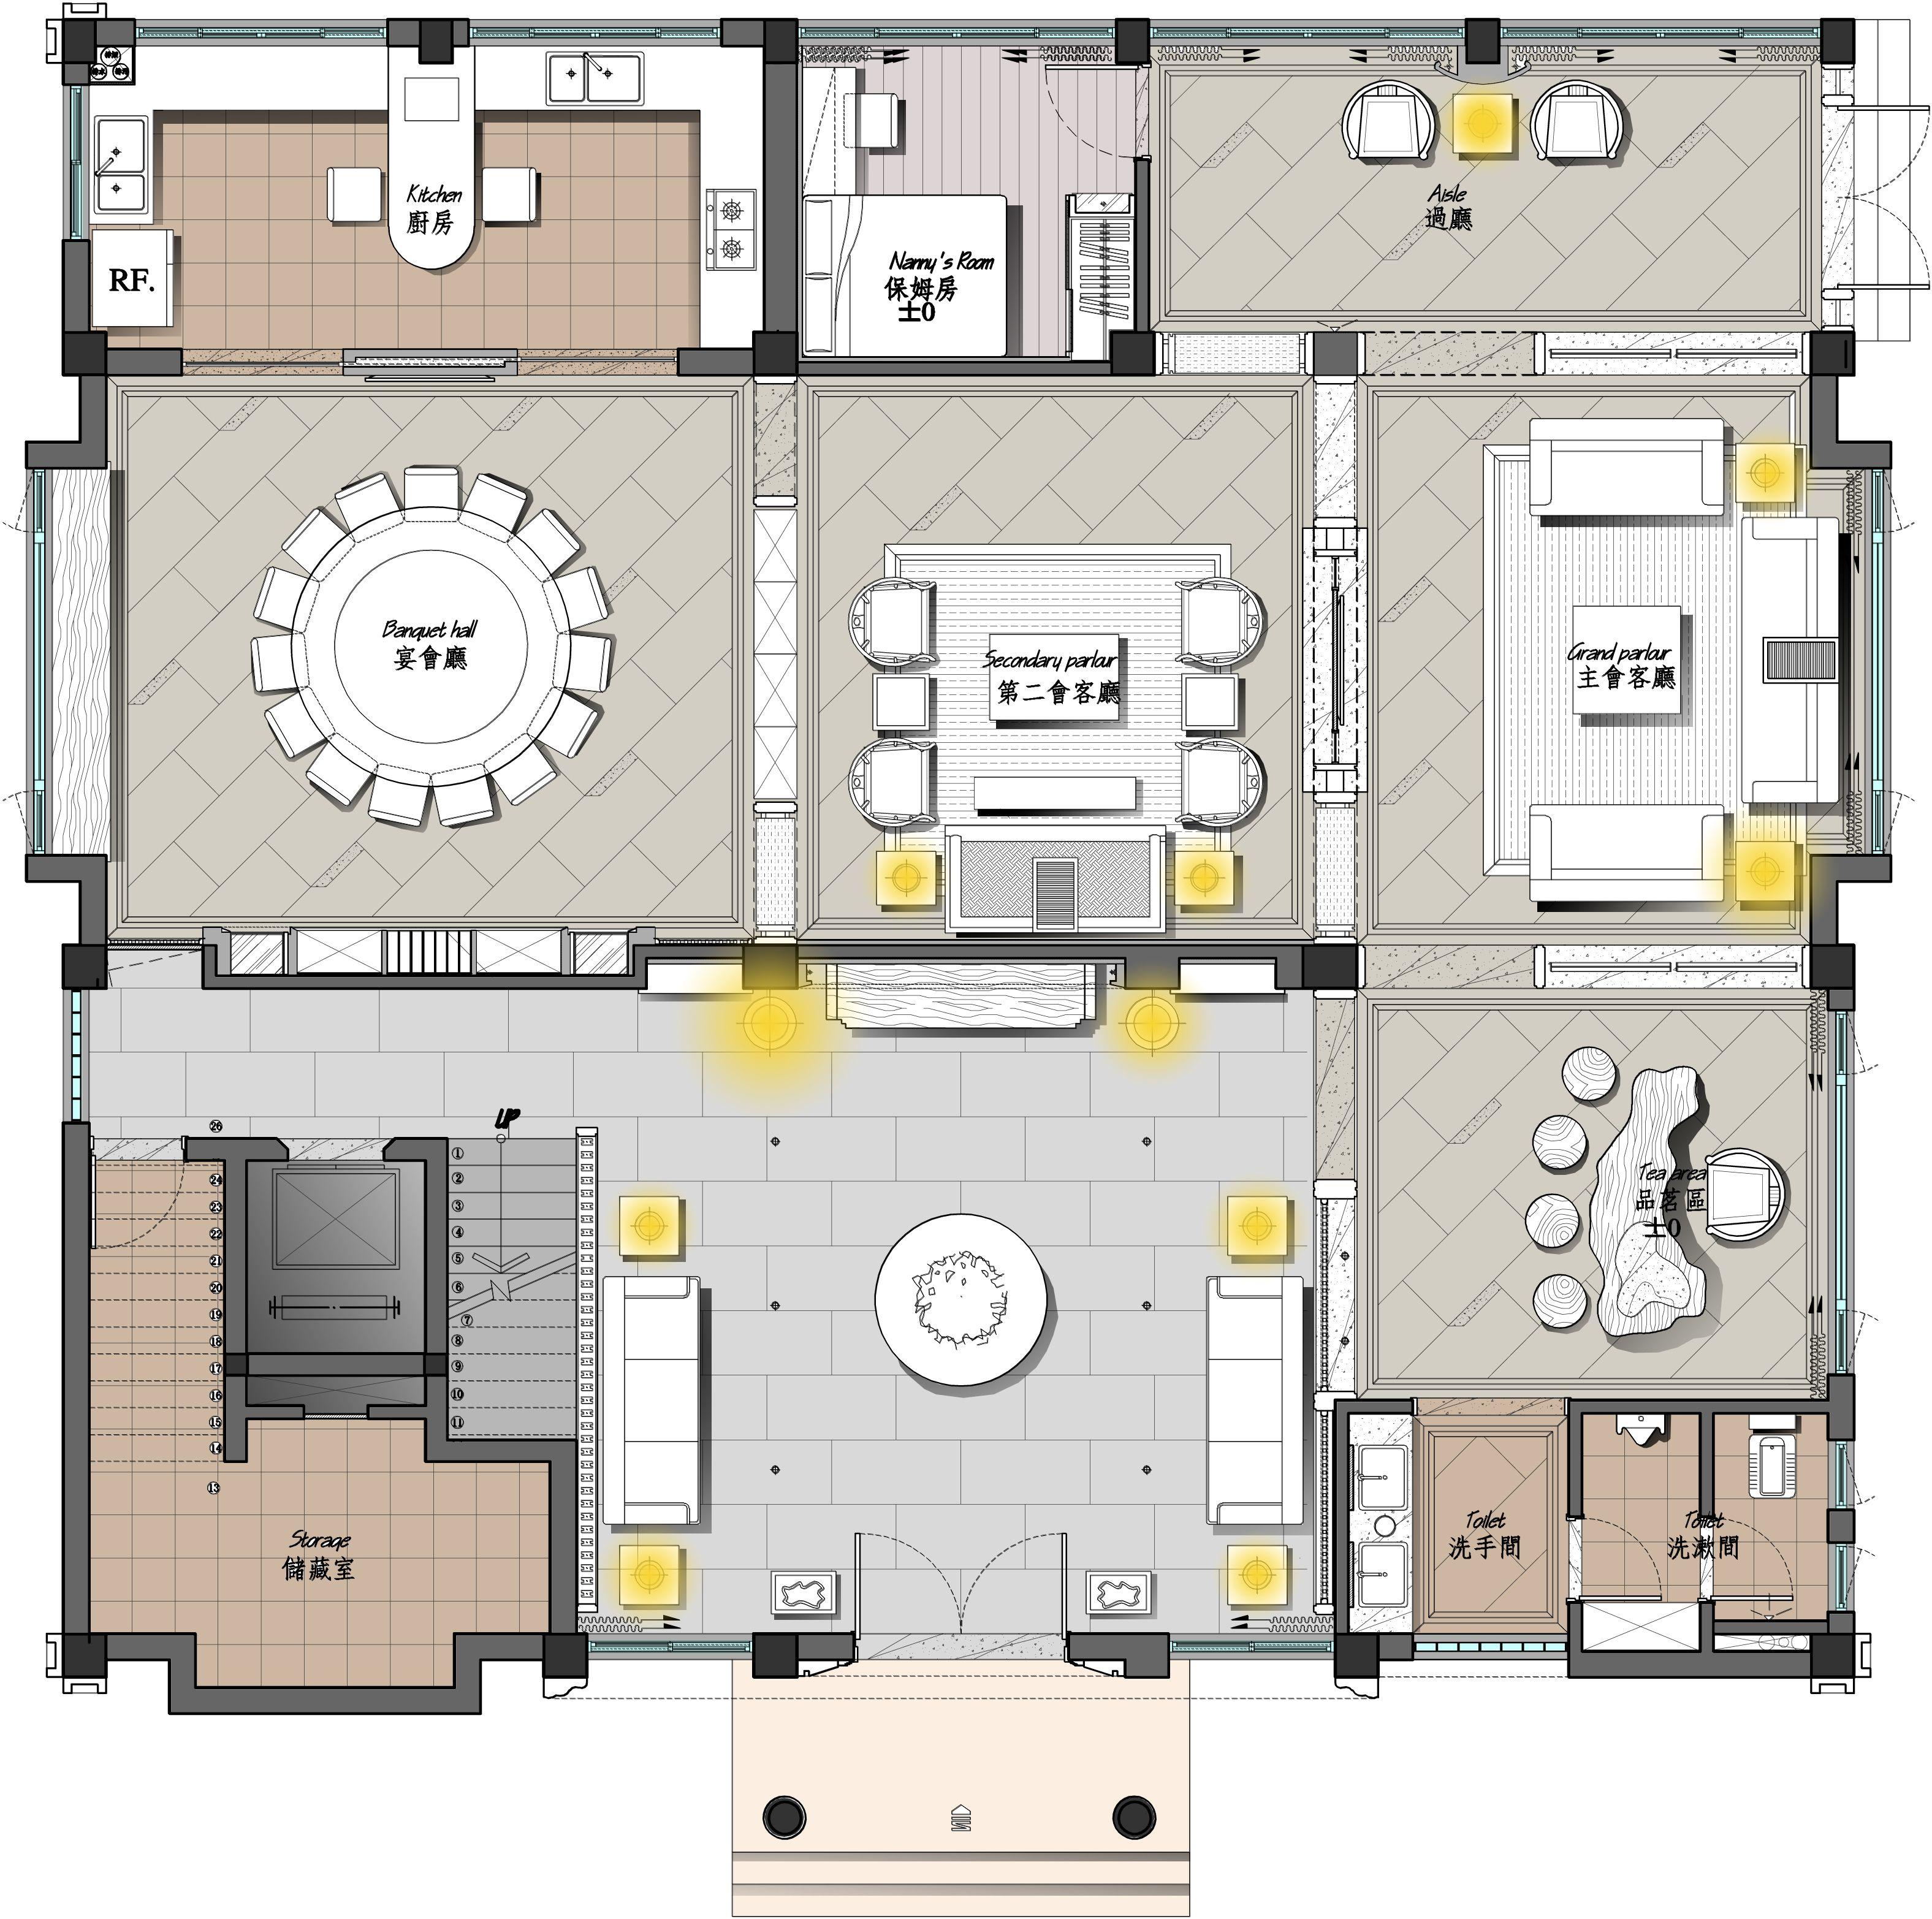 【z-house】--自建别墅设计说明图片